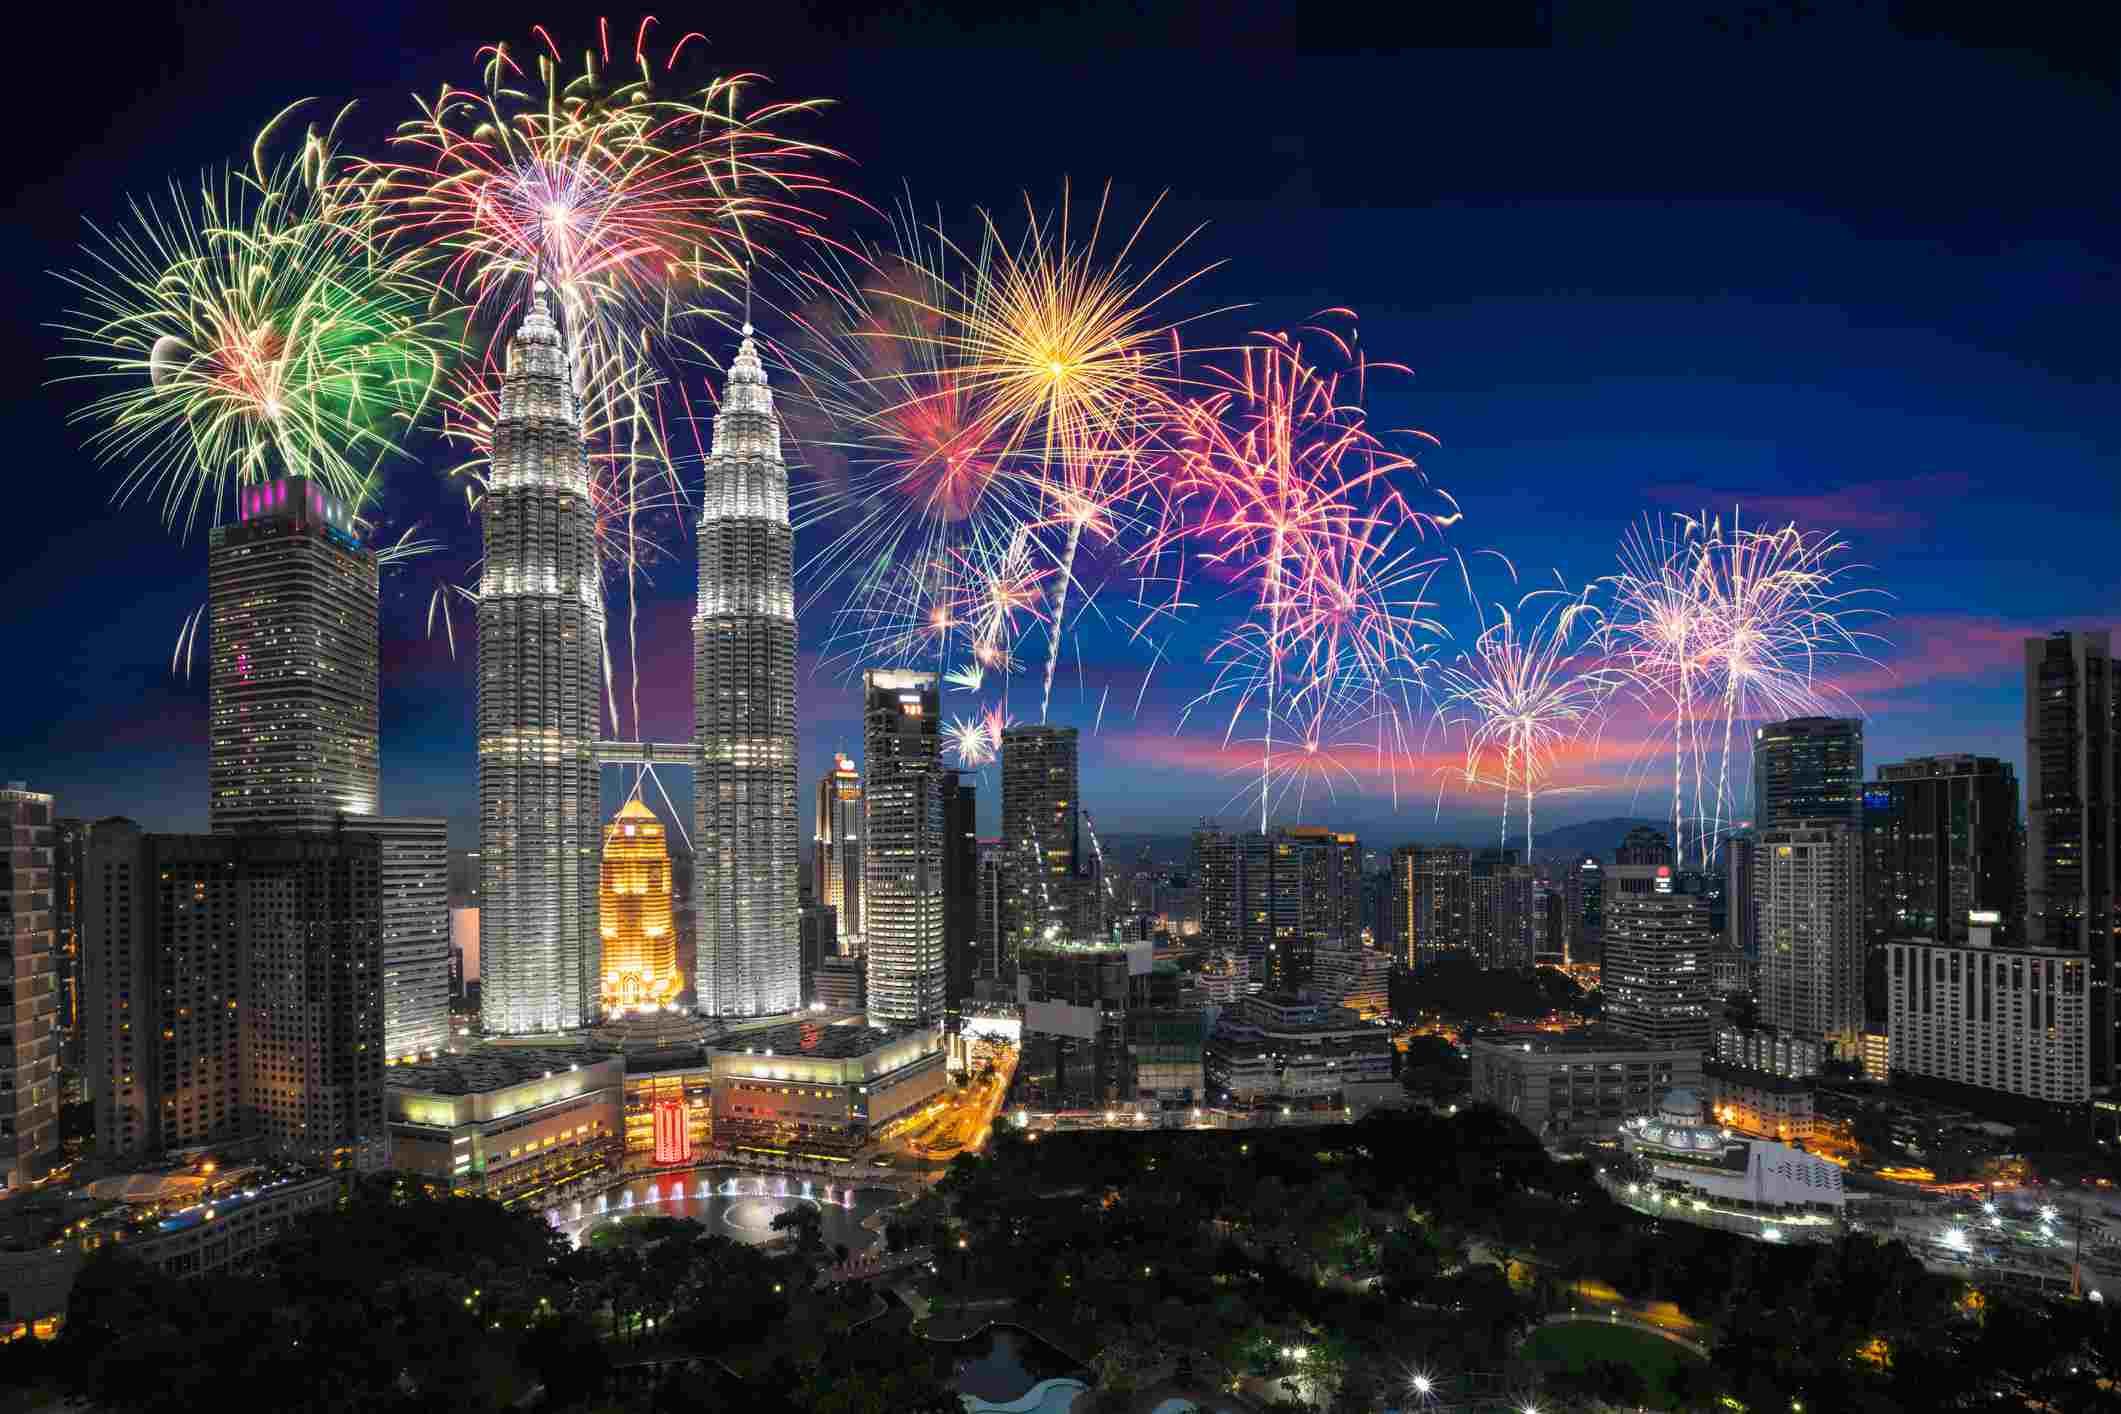 Fireworks display over skyline of Kuala Lumpur city during Hari Merdeka, Malaysia's Independence Day